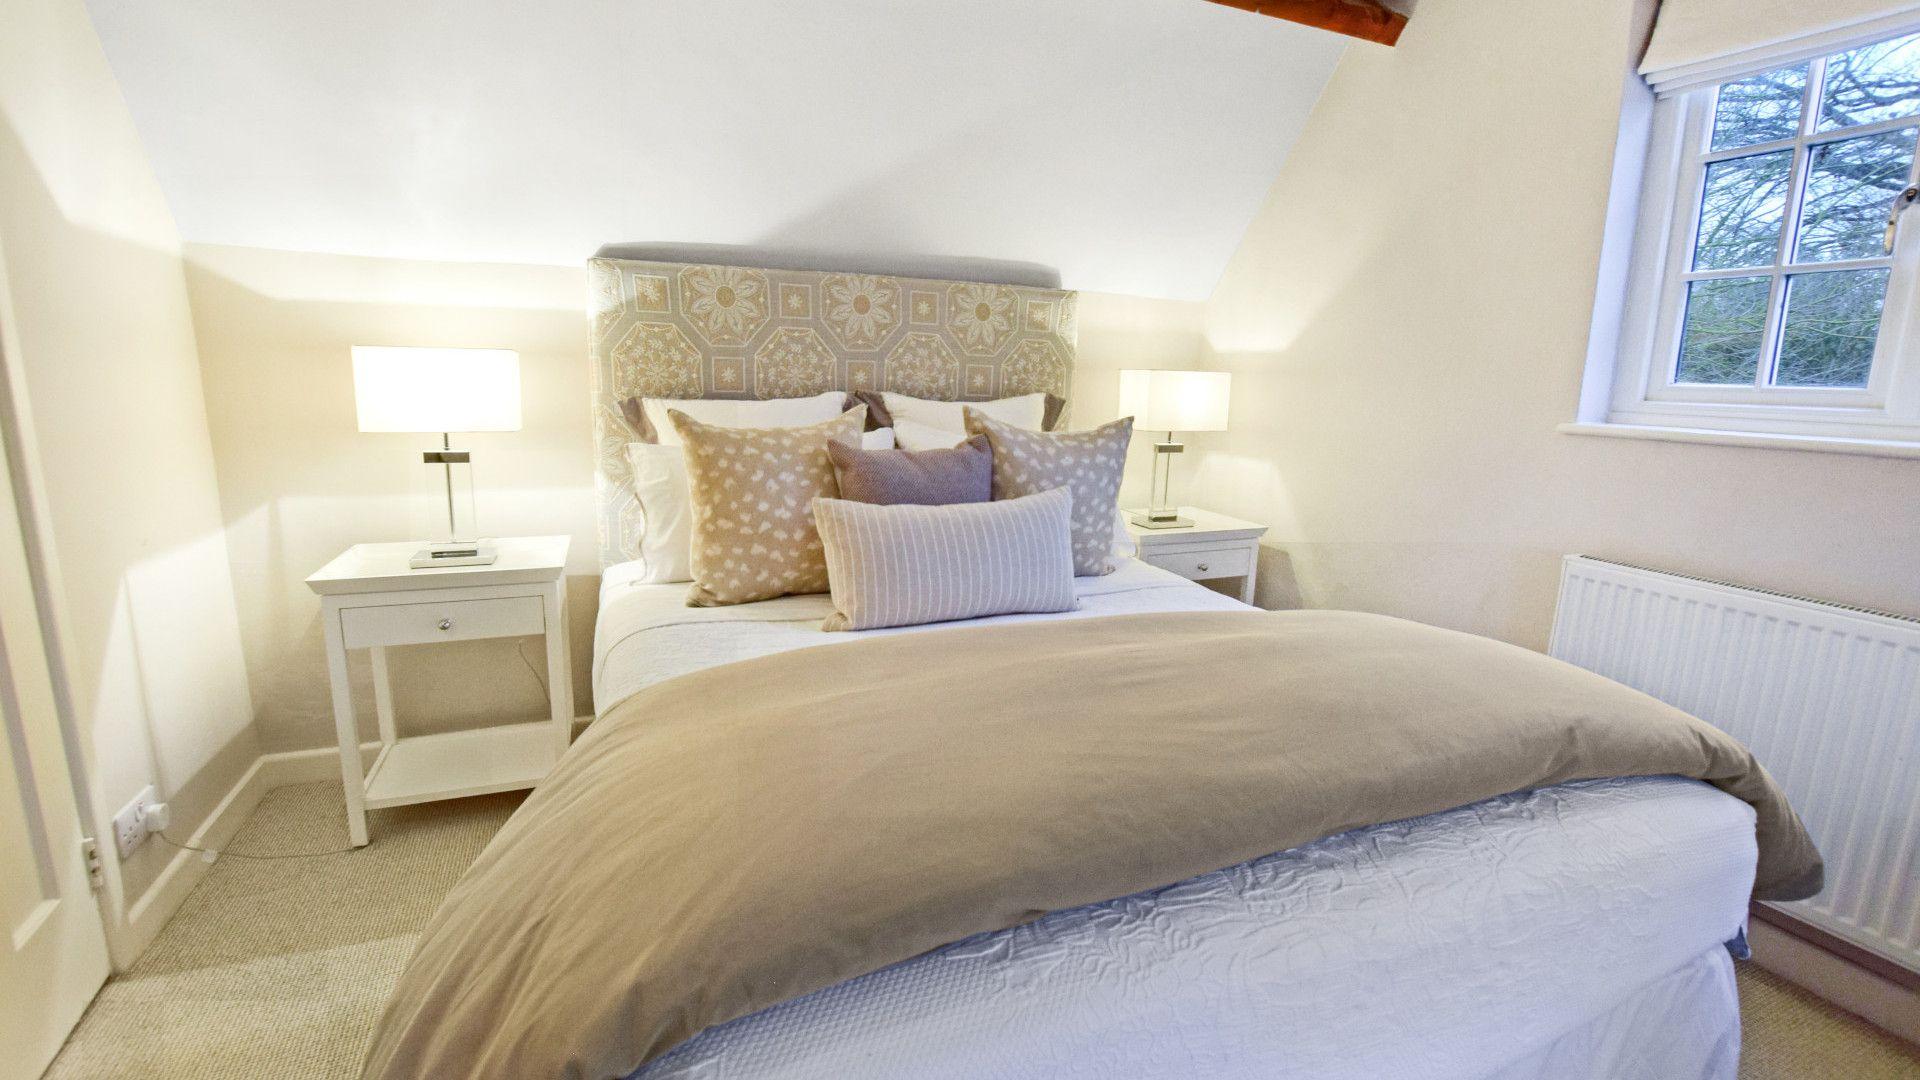 Bedroom 2, king-size, Thatch Cottage, Bolthole Retreats